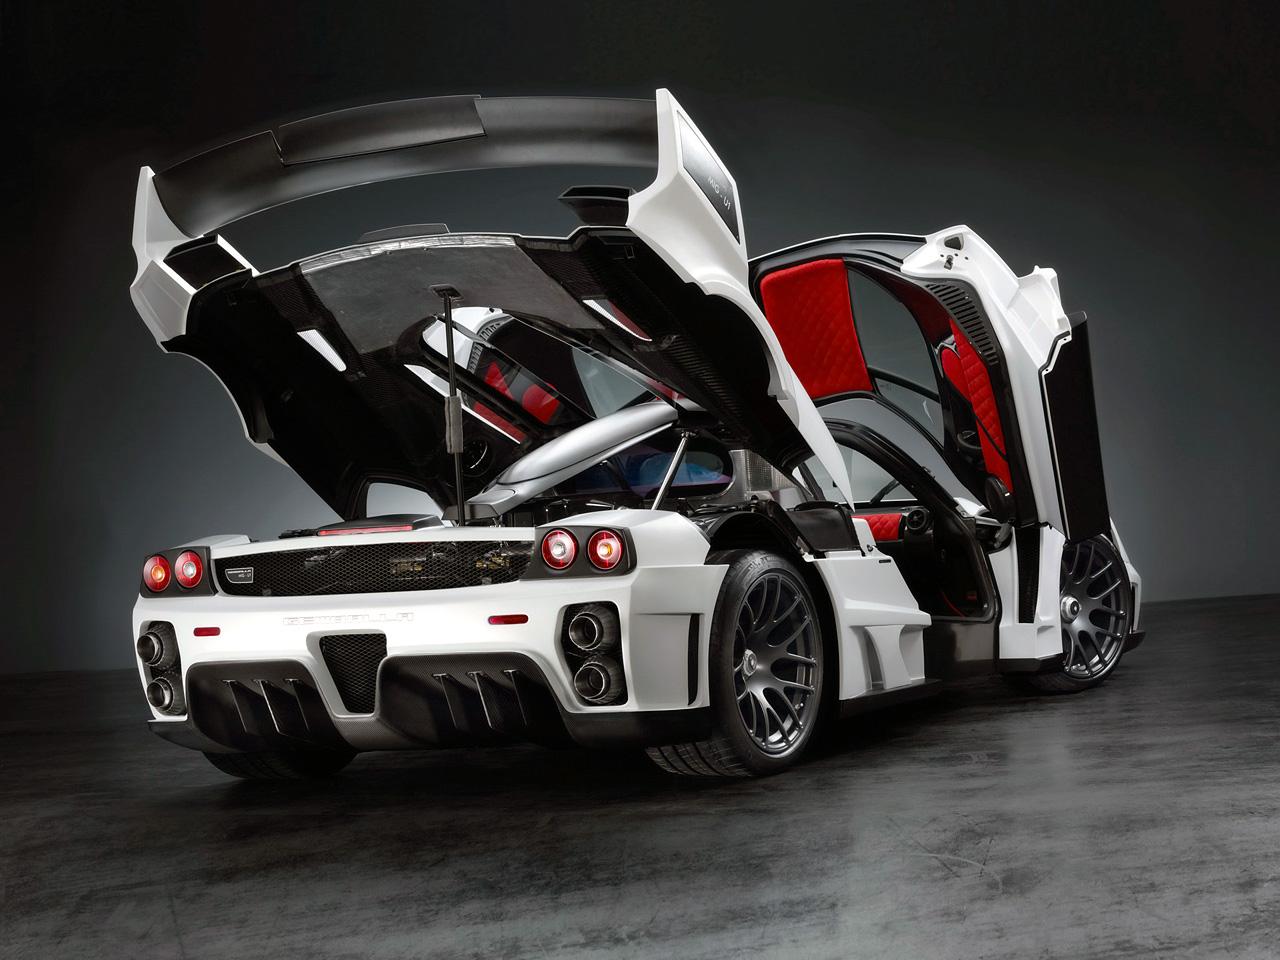 Wallpaper Mobil Sport Modifikasi: Gambar Modifikasi Gemballa MIG-U1 V12-2010